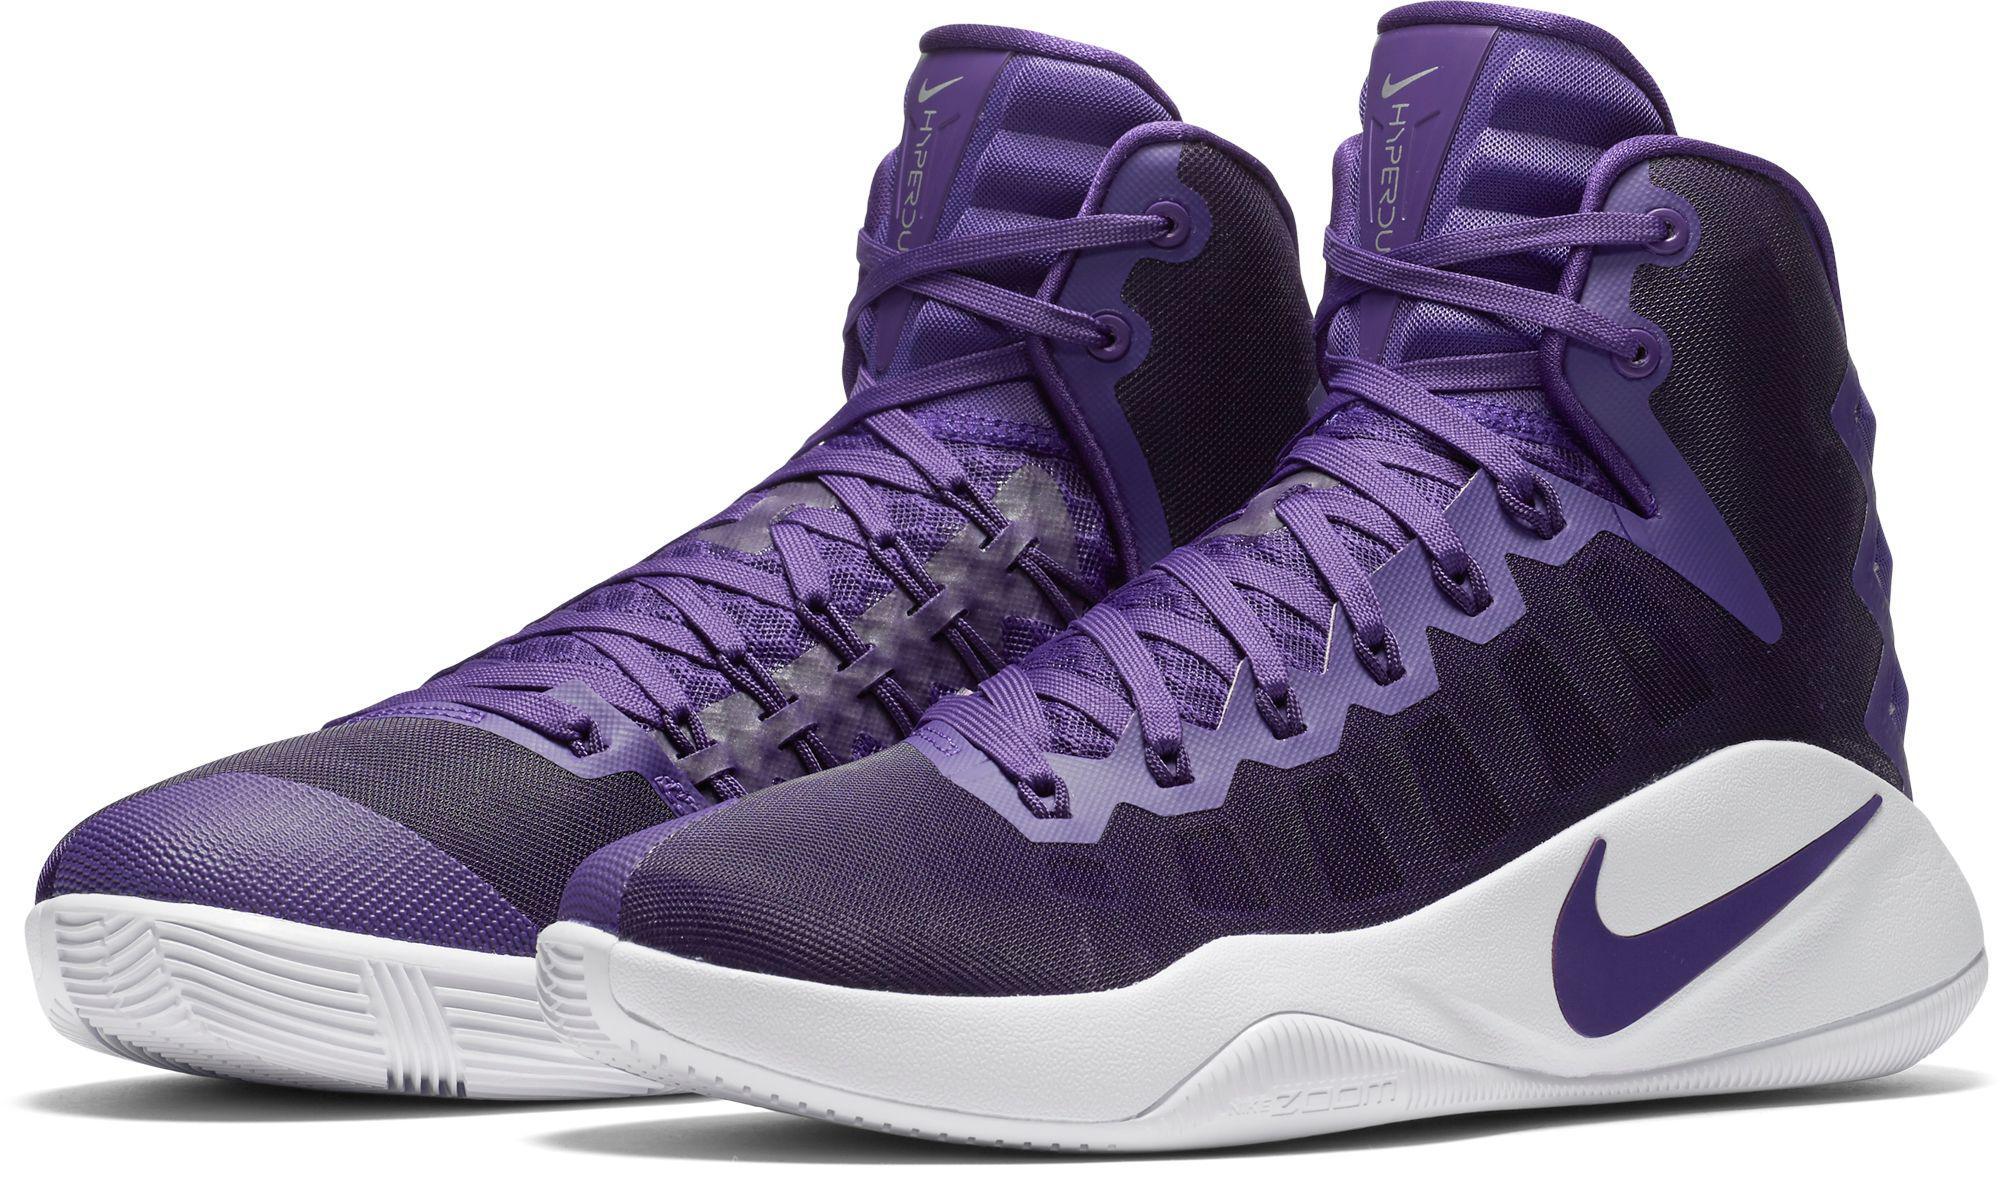 new arrivals 3373f 7dc45 nike hyperdunk 2016 purple